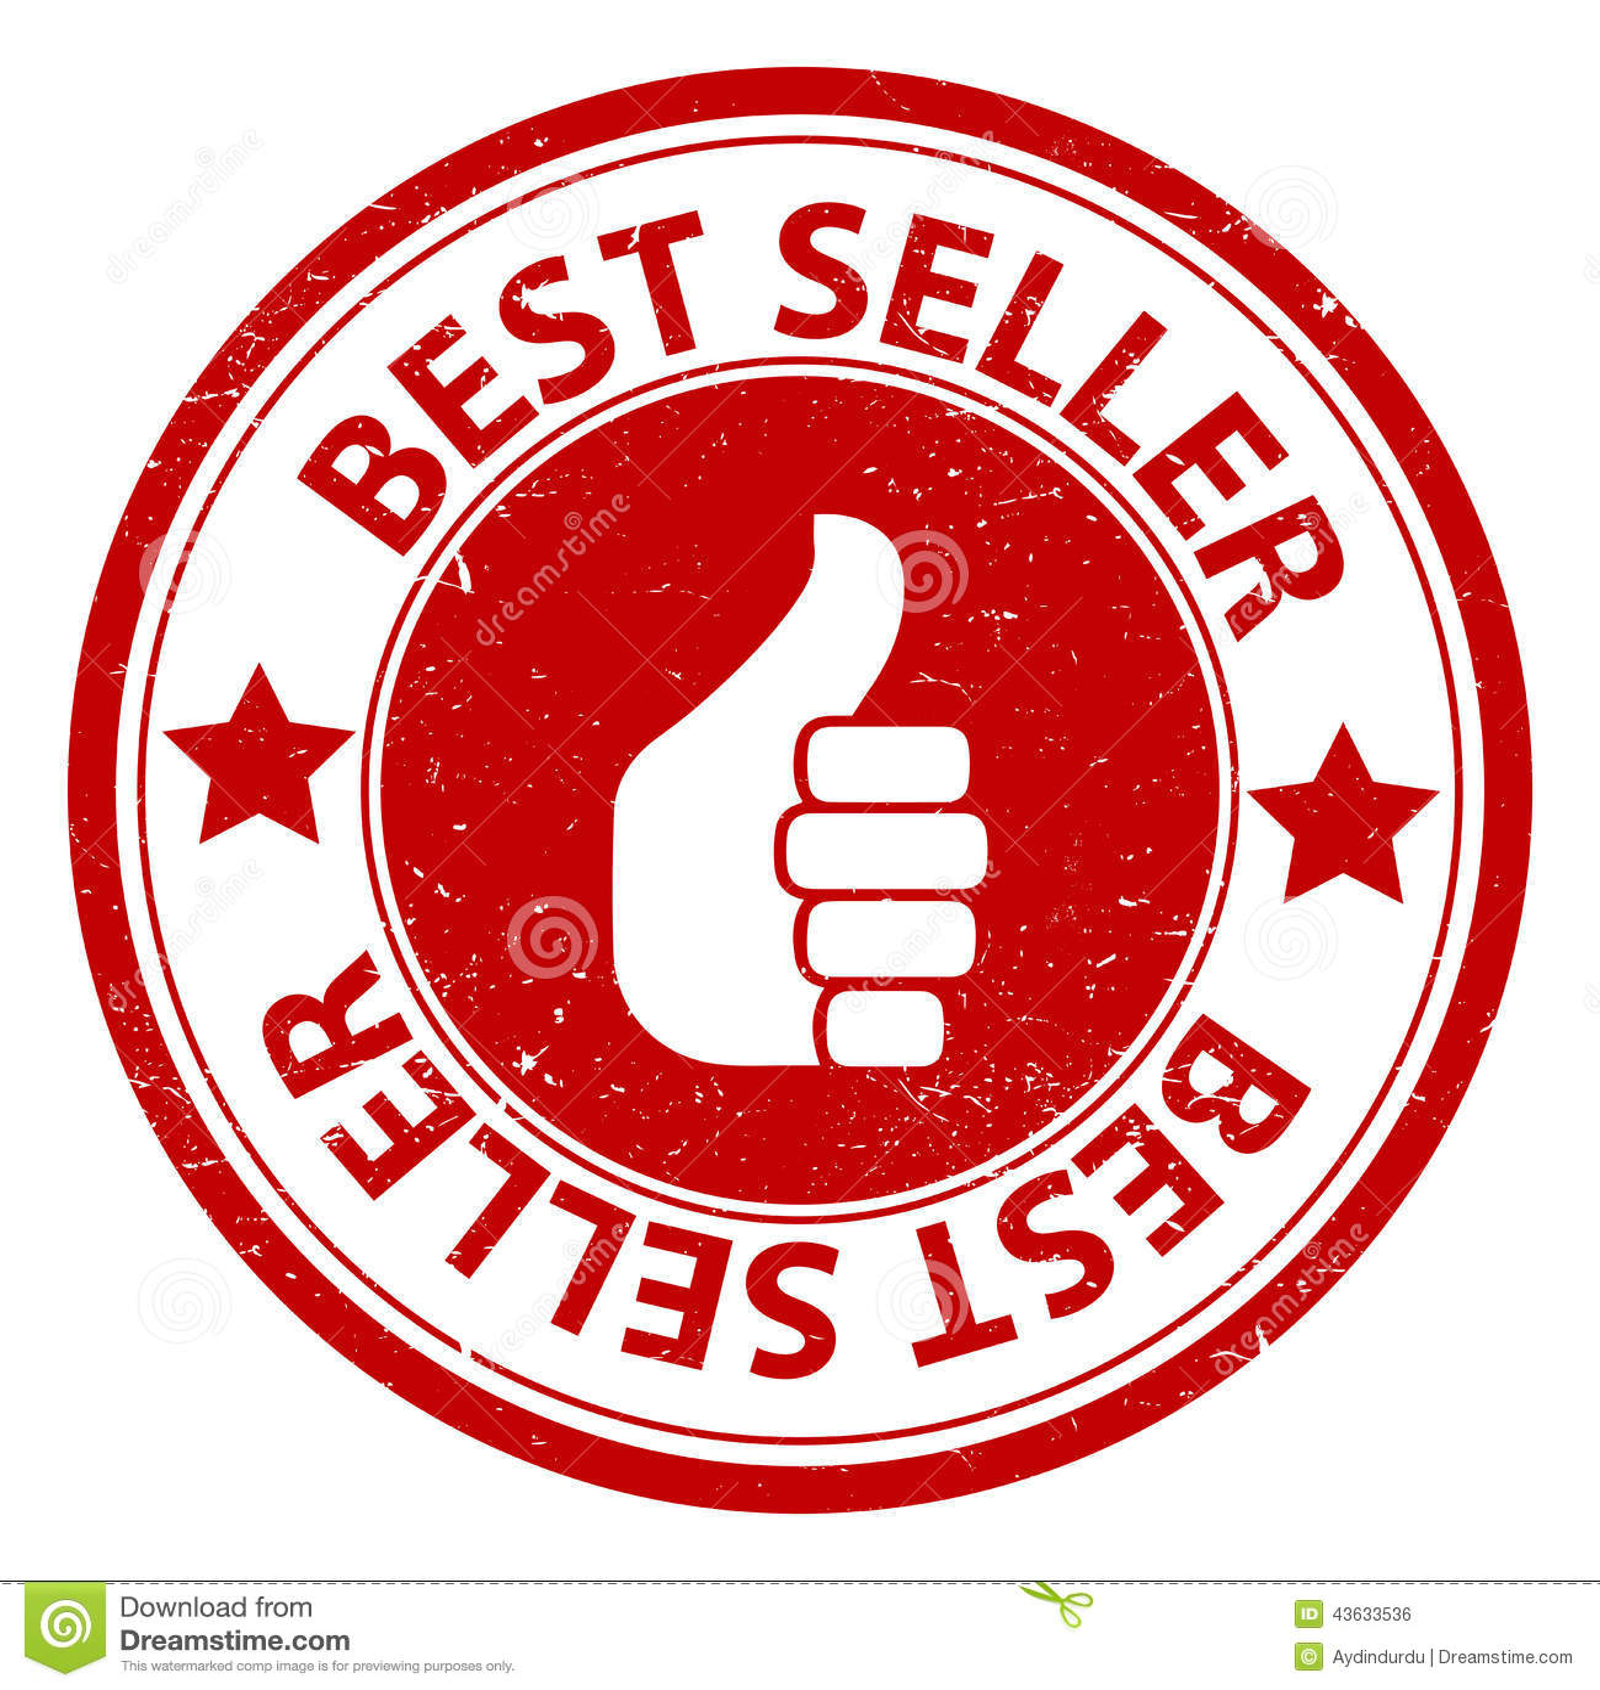 Best Seller Stock Vector Illustration Of Design Thumbs 43633536